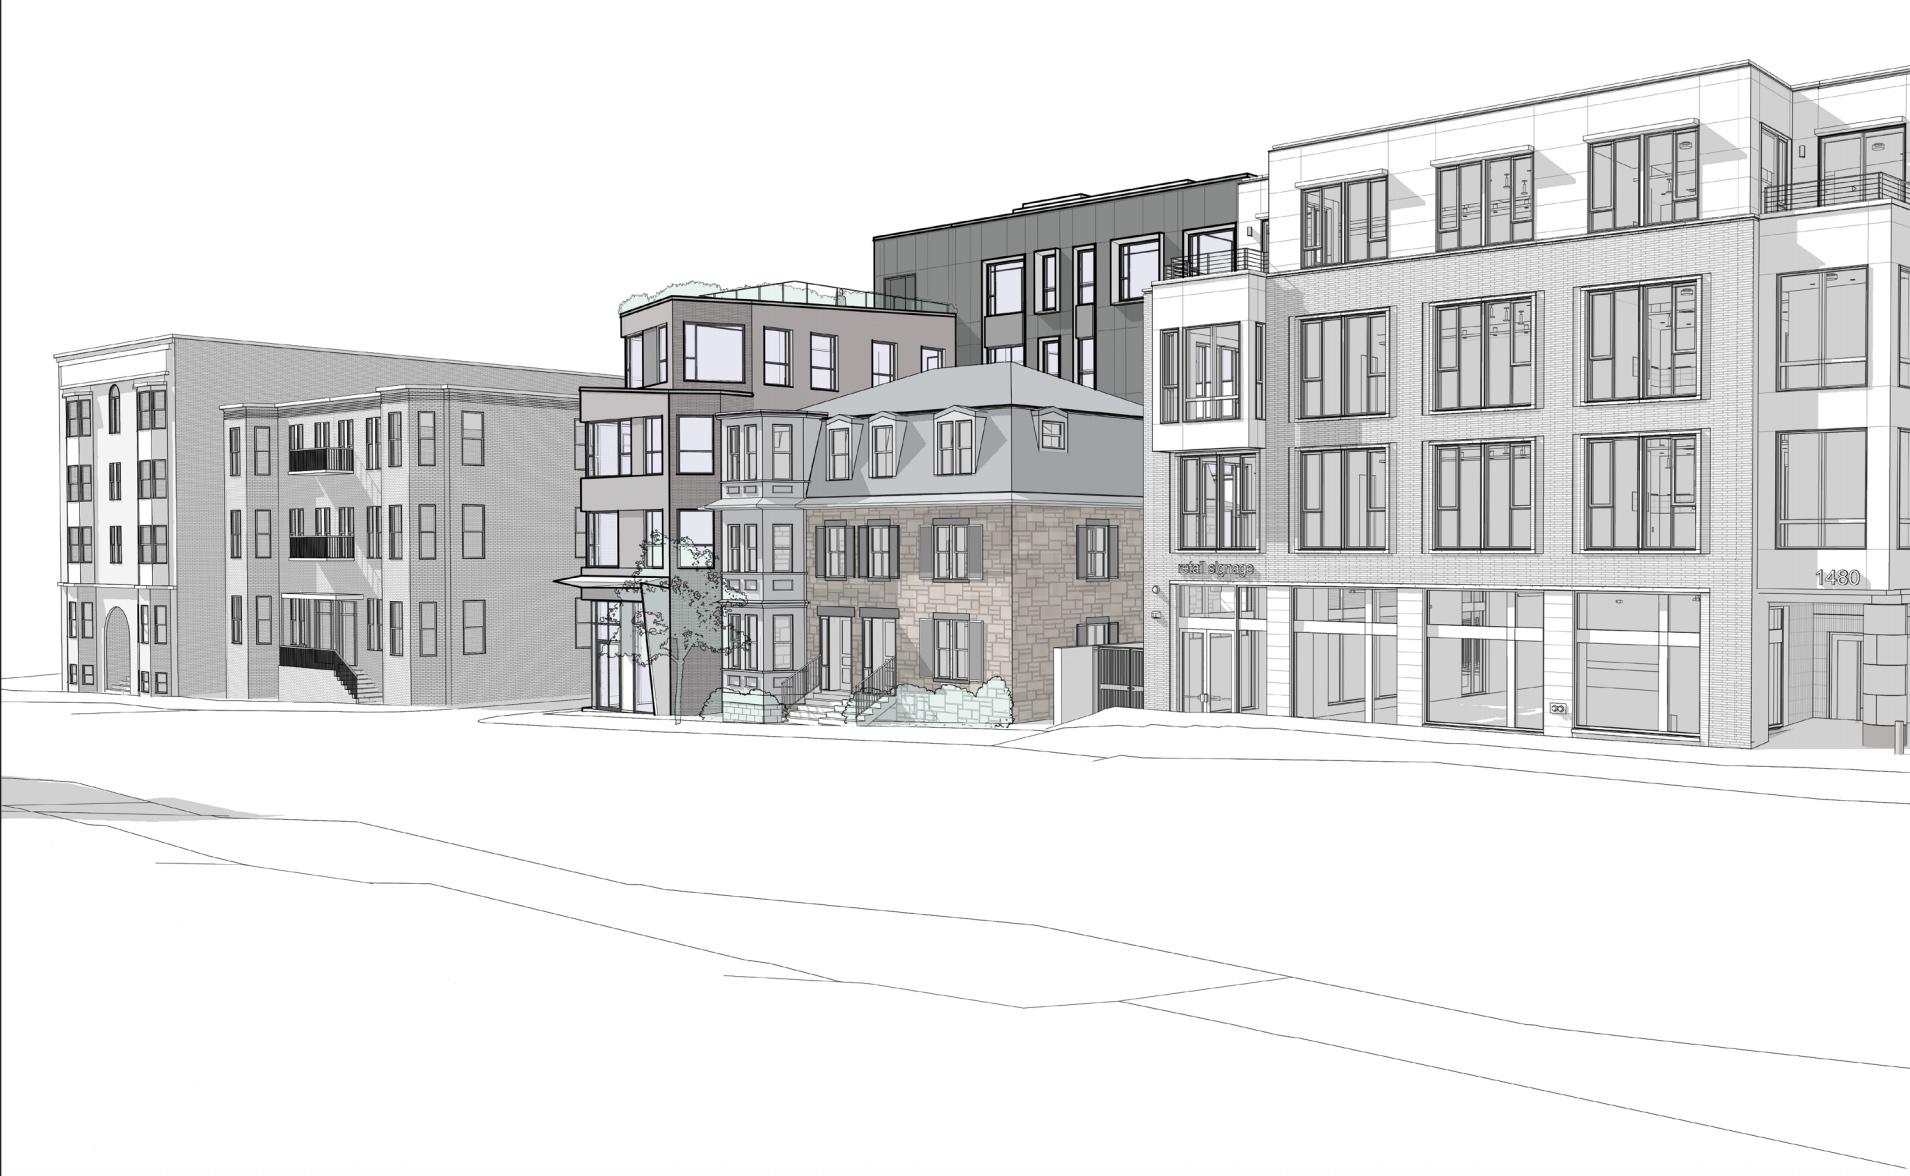 1470 tremont street savage properties residential retail mixed use development mission hill roxbury mbta orange line architect hacin associates rendering 3